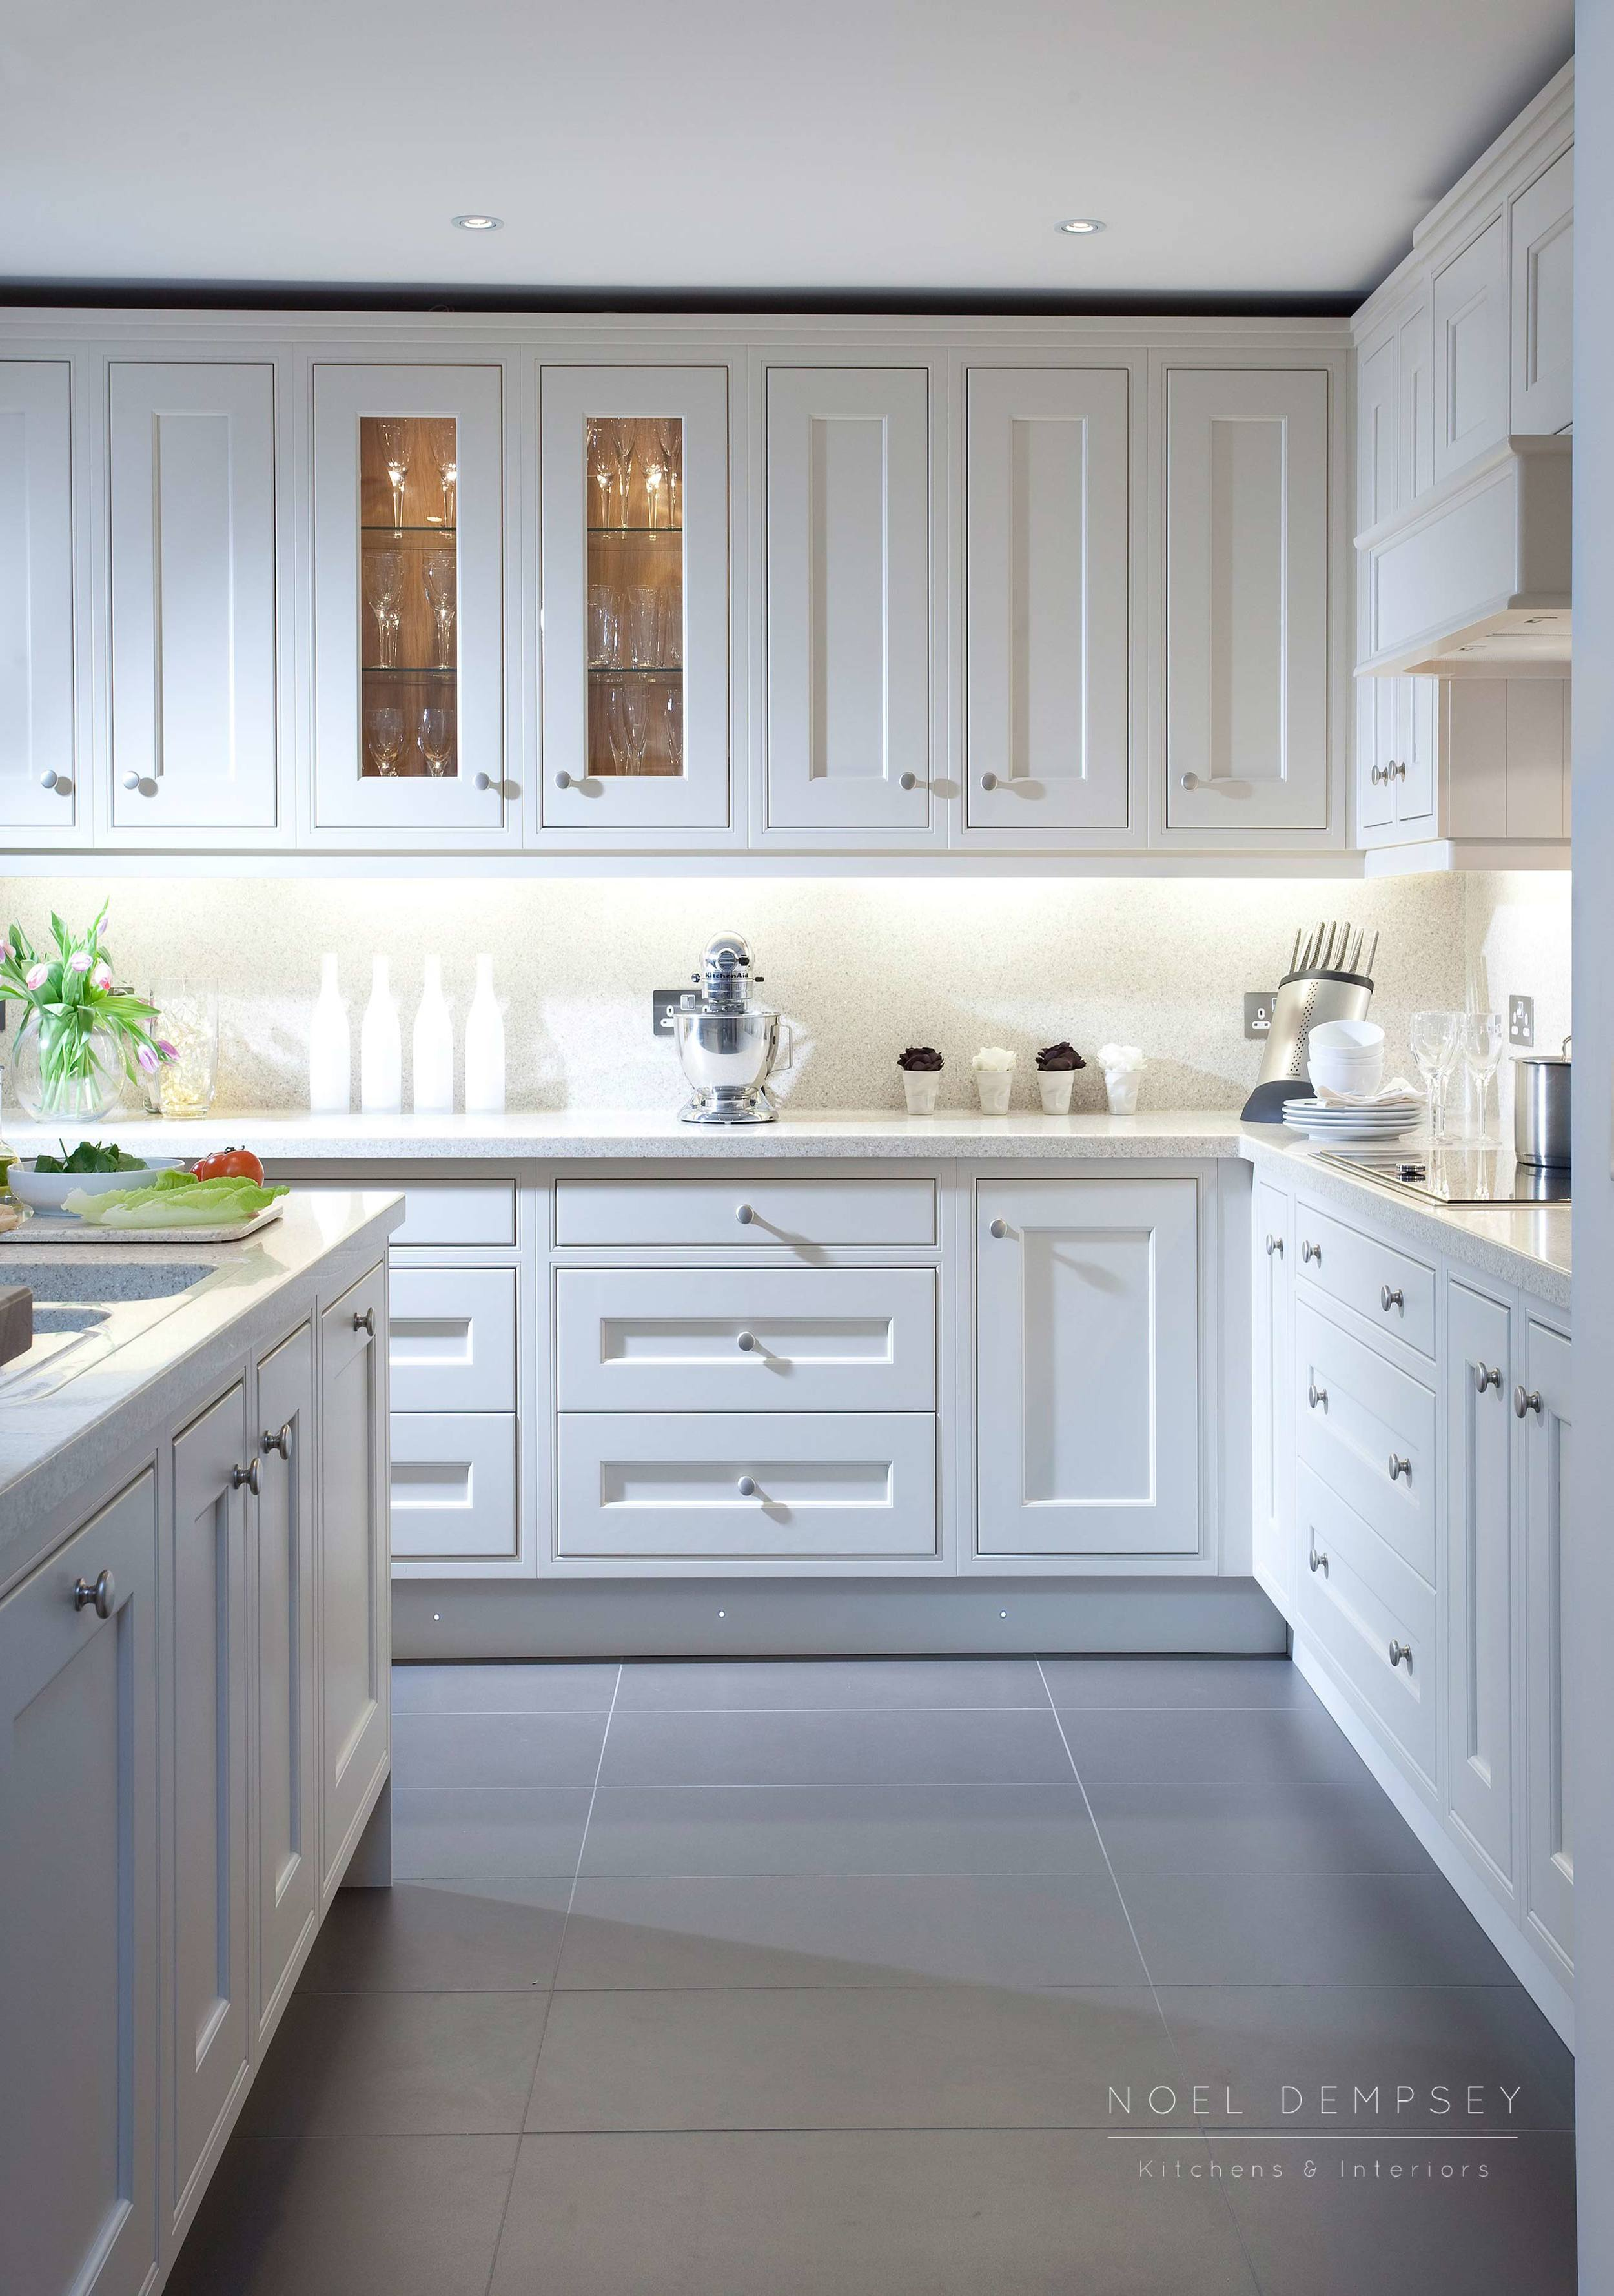 Blackrock-painted-kitchen-dublin-5.jpg